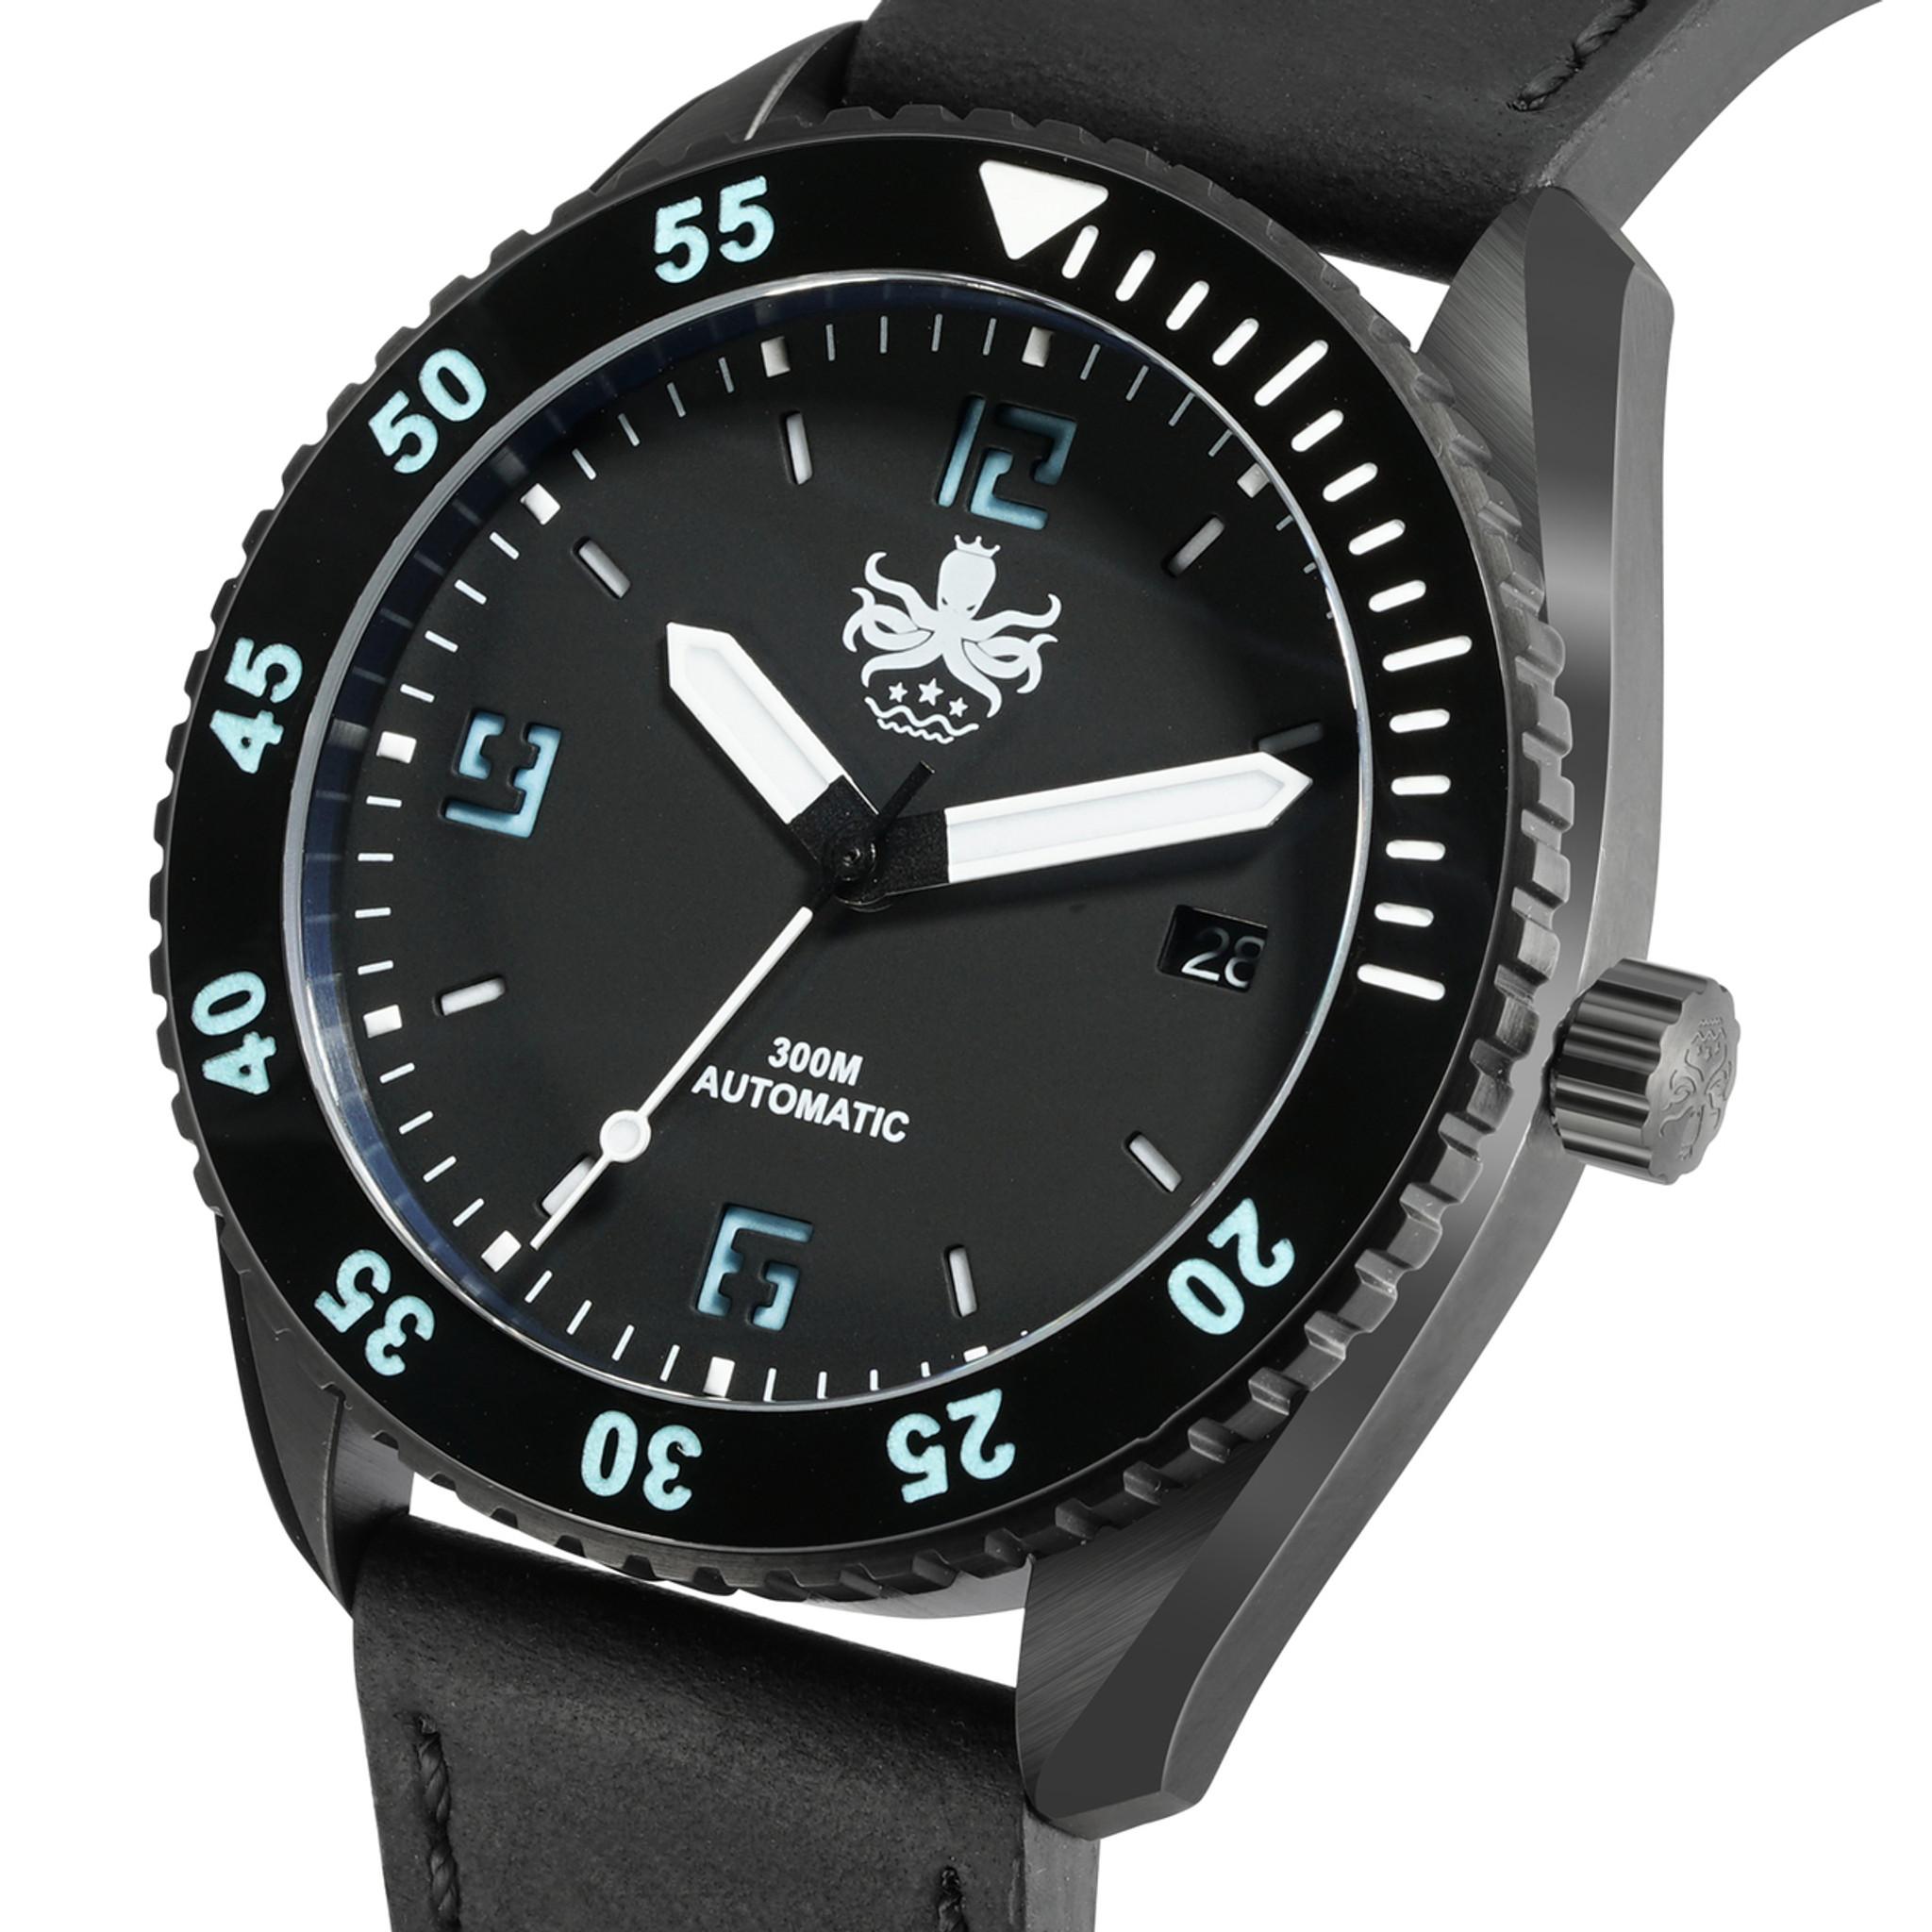 399cf0ba1e4 PHOIBOS REEF MASTER PY015C DLC 300M Automatic Diver Watch Black